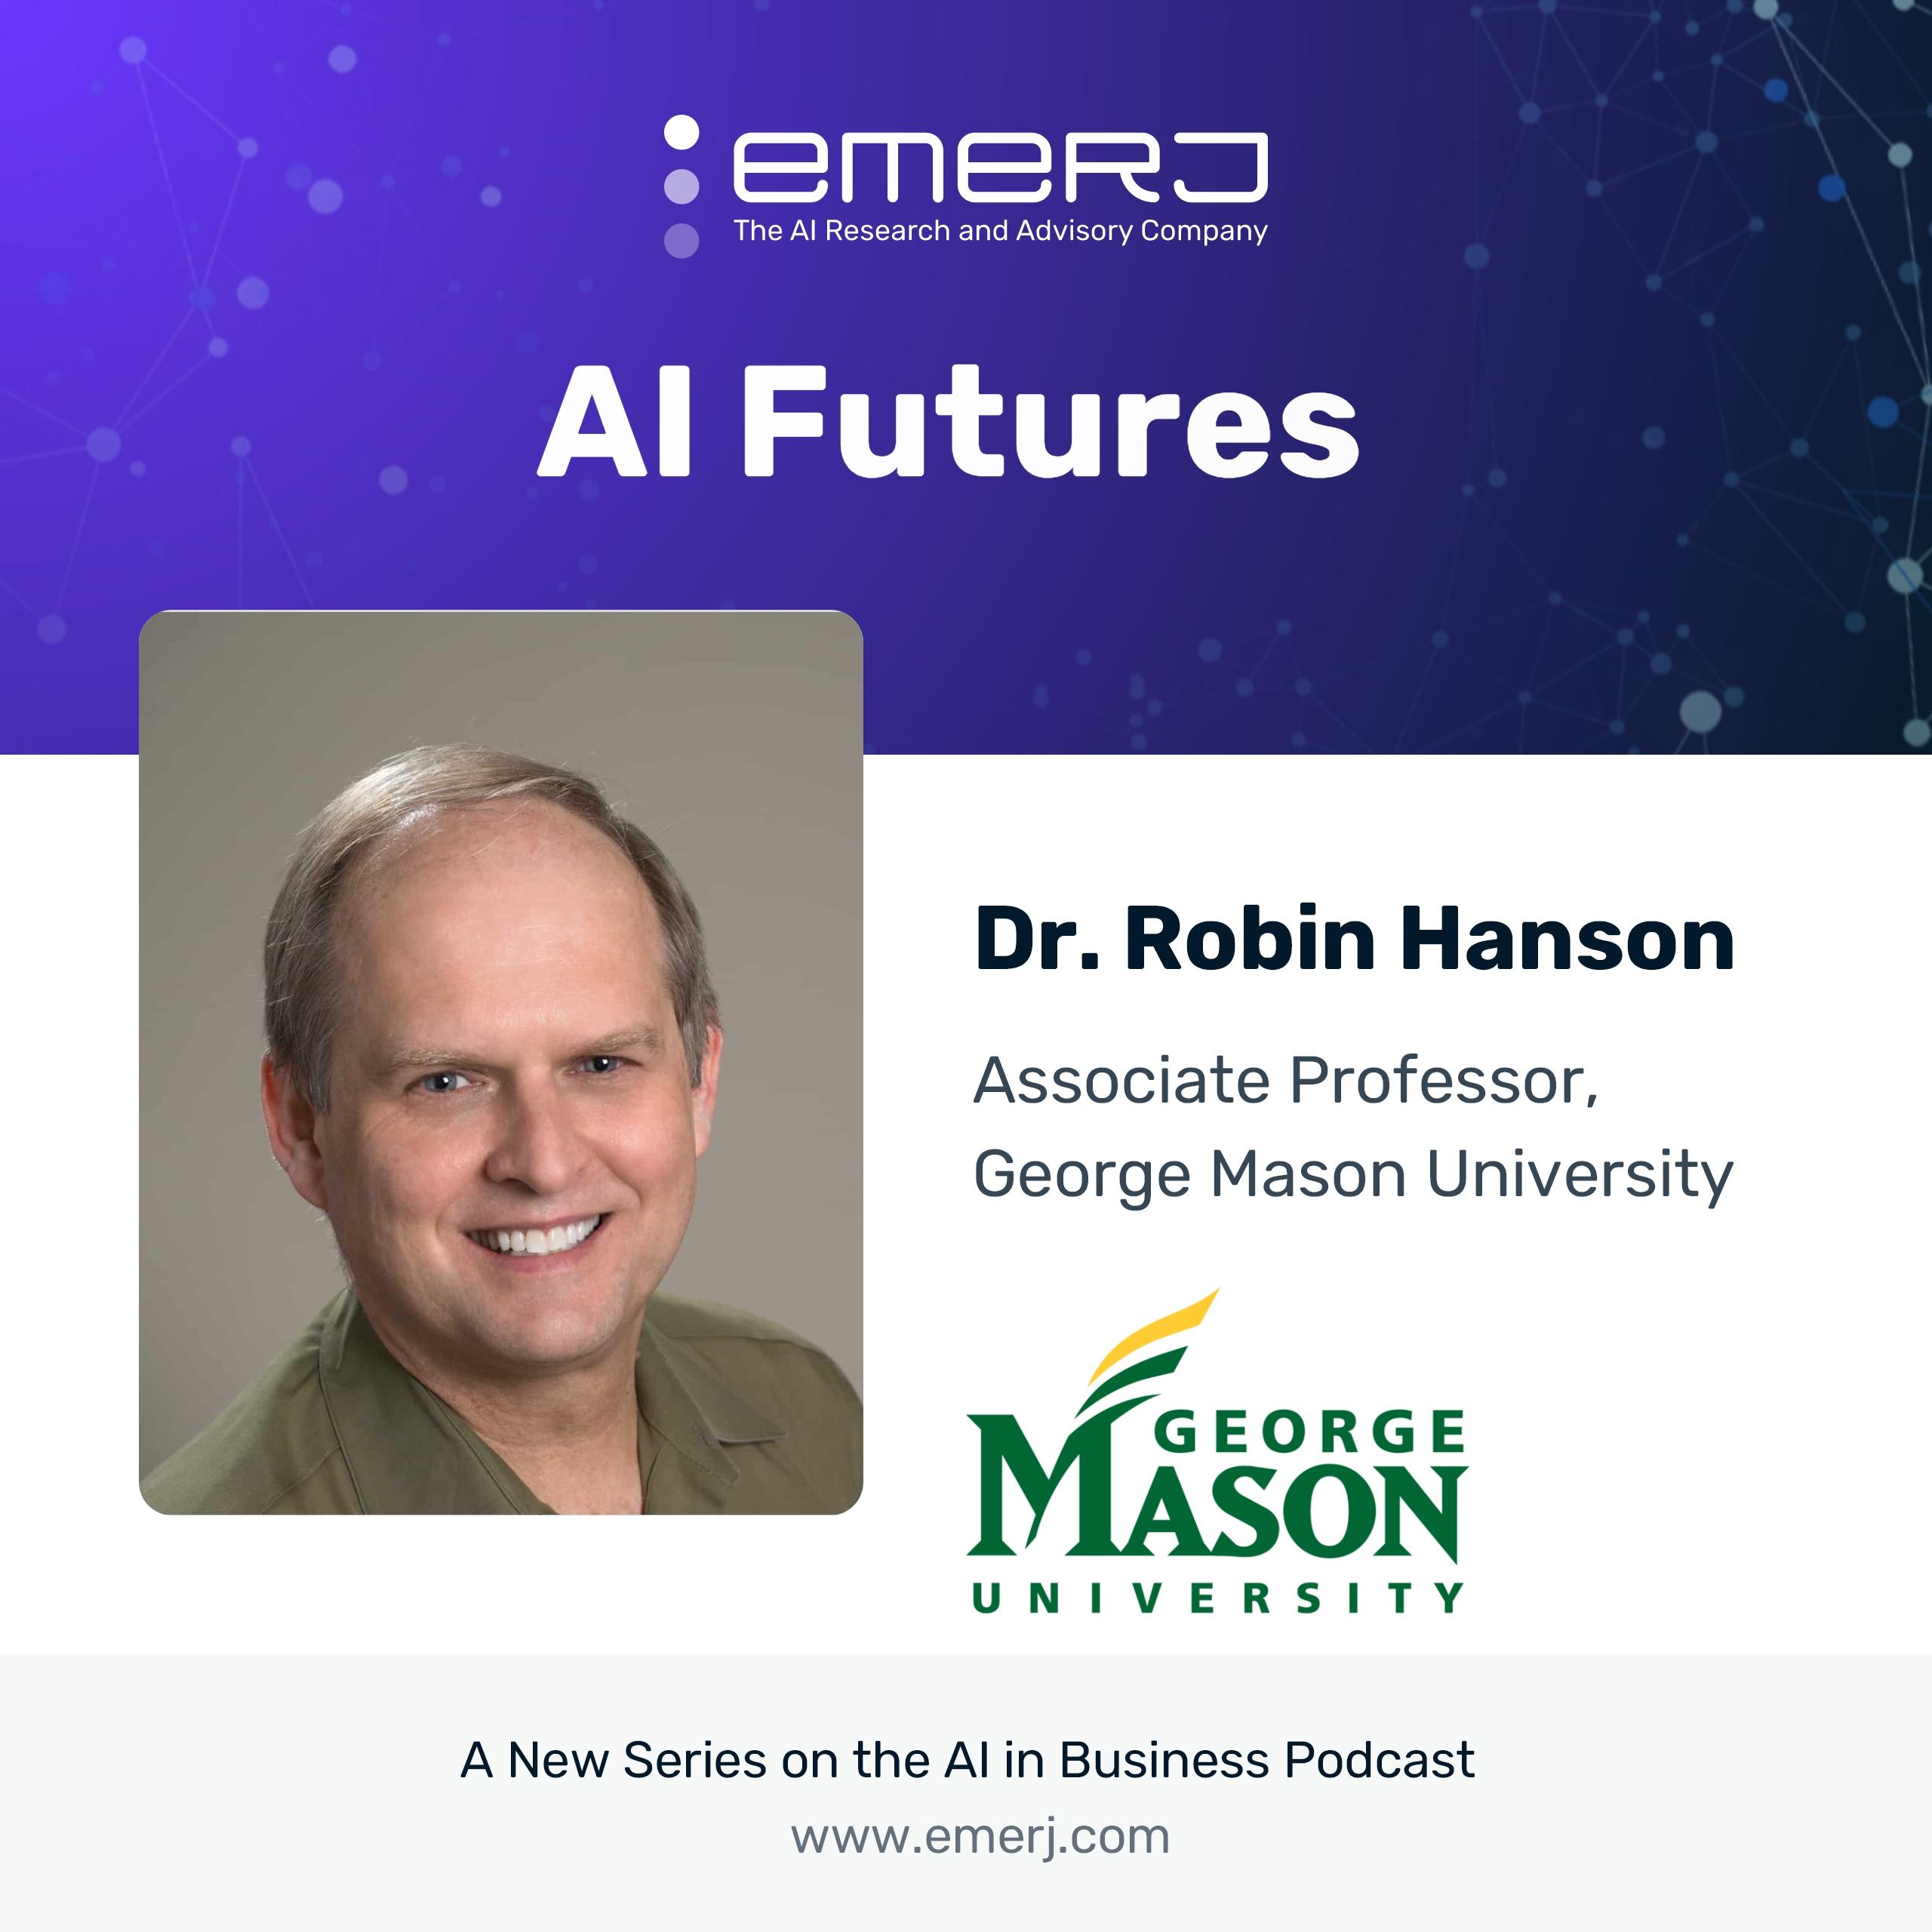 [AI Futures - S2E2] Dr. Robin Hanson on AGI, Emulating Human Consciousness, and the Future of Work and Life